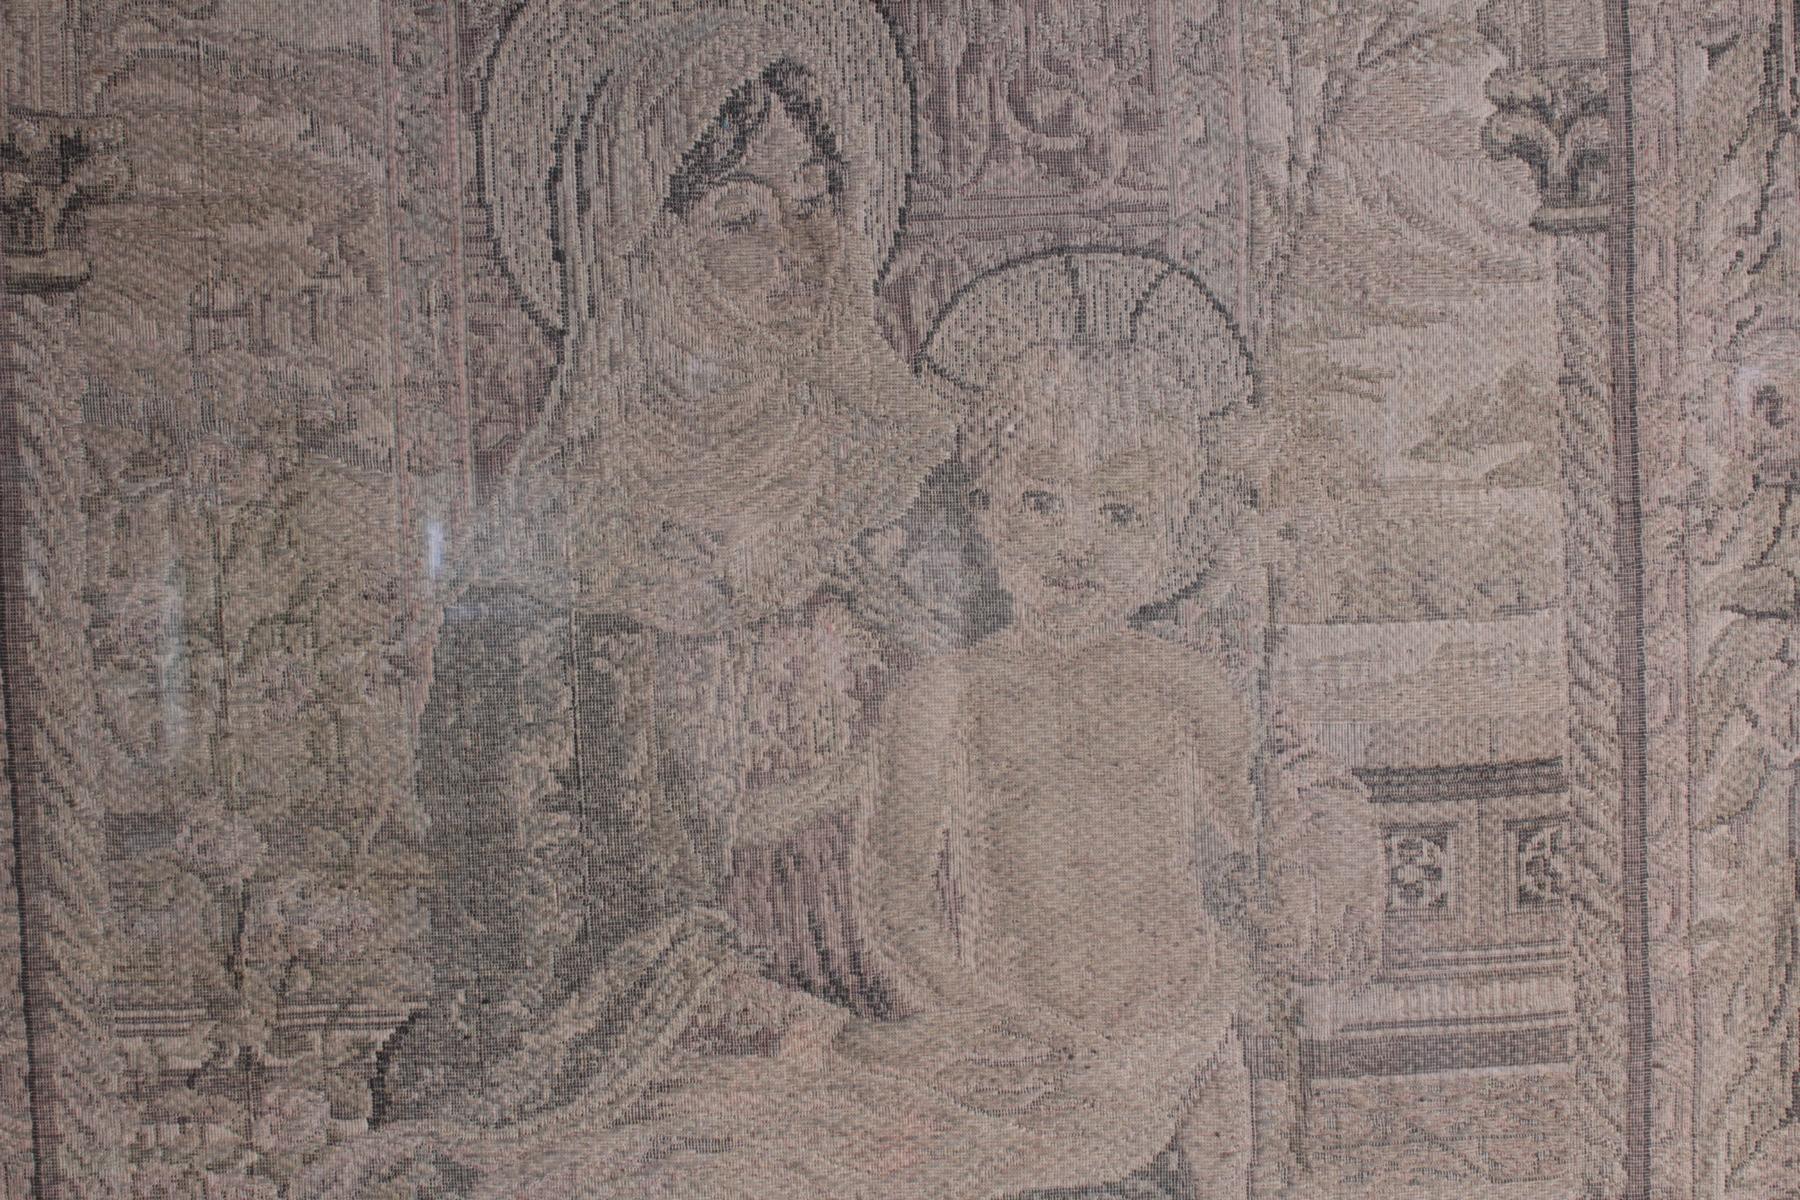 Religiöser Gobelin, 19. Jahrhundert-3